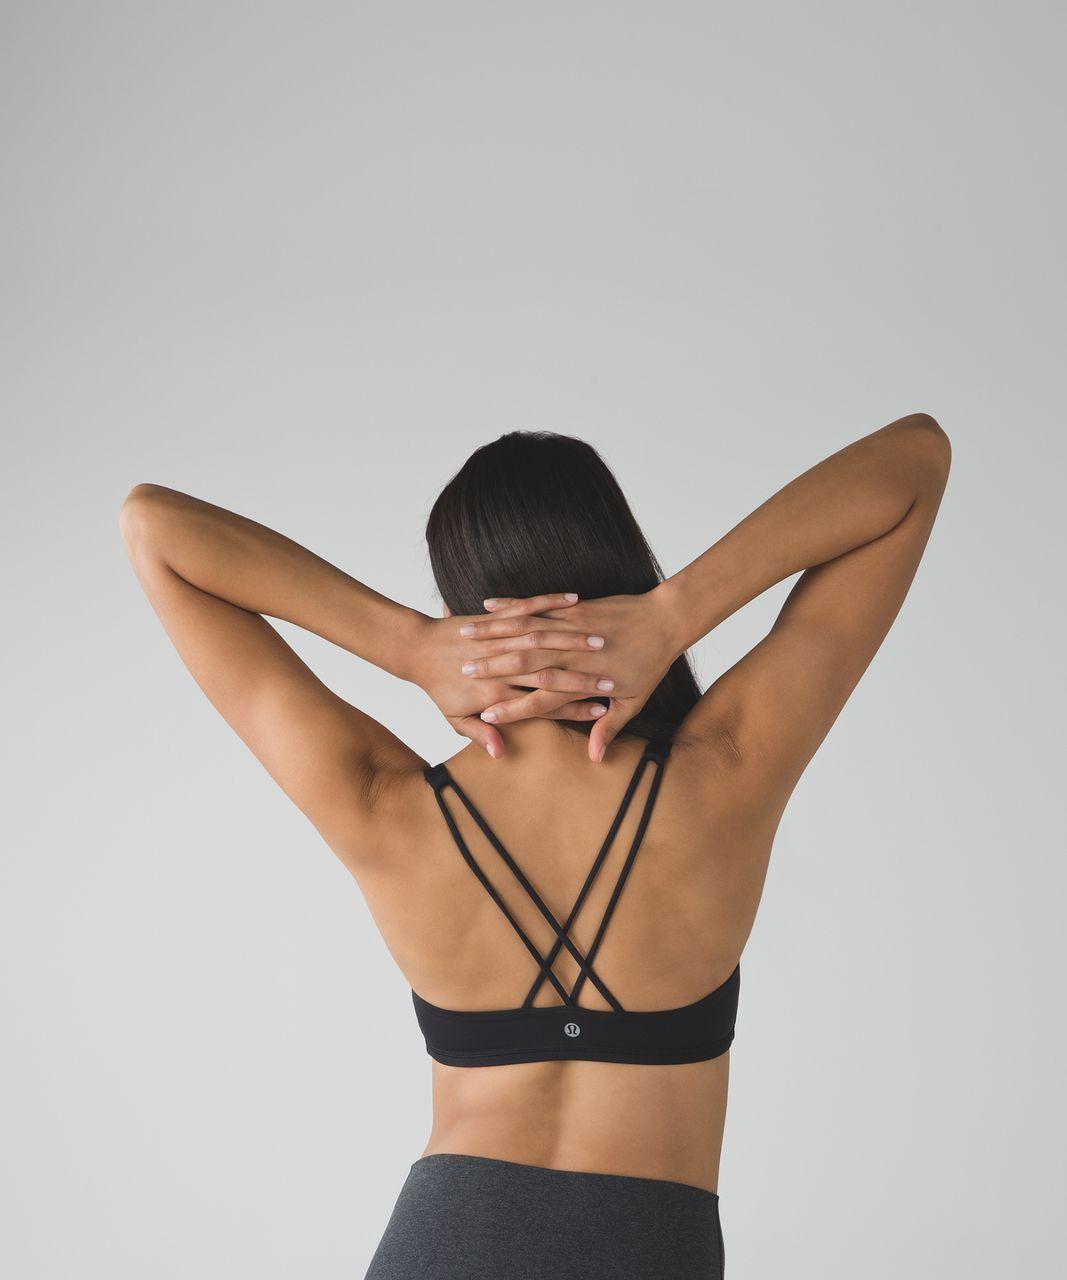 Lululemon Free To Be Bra - Black